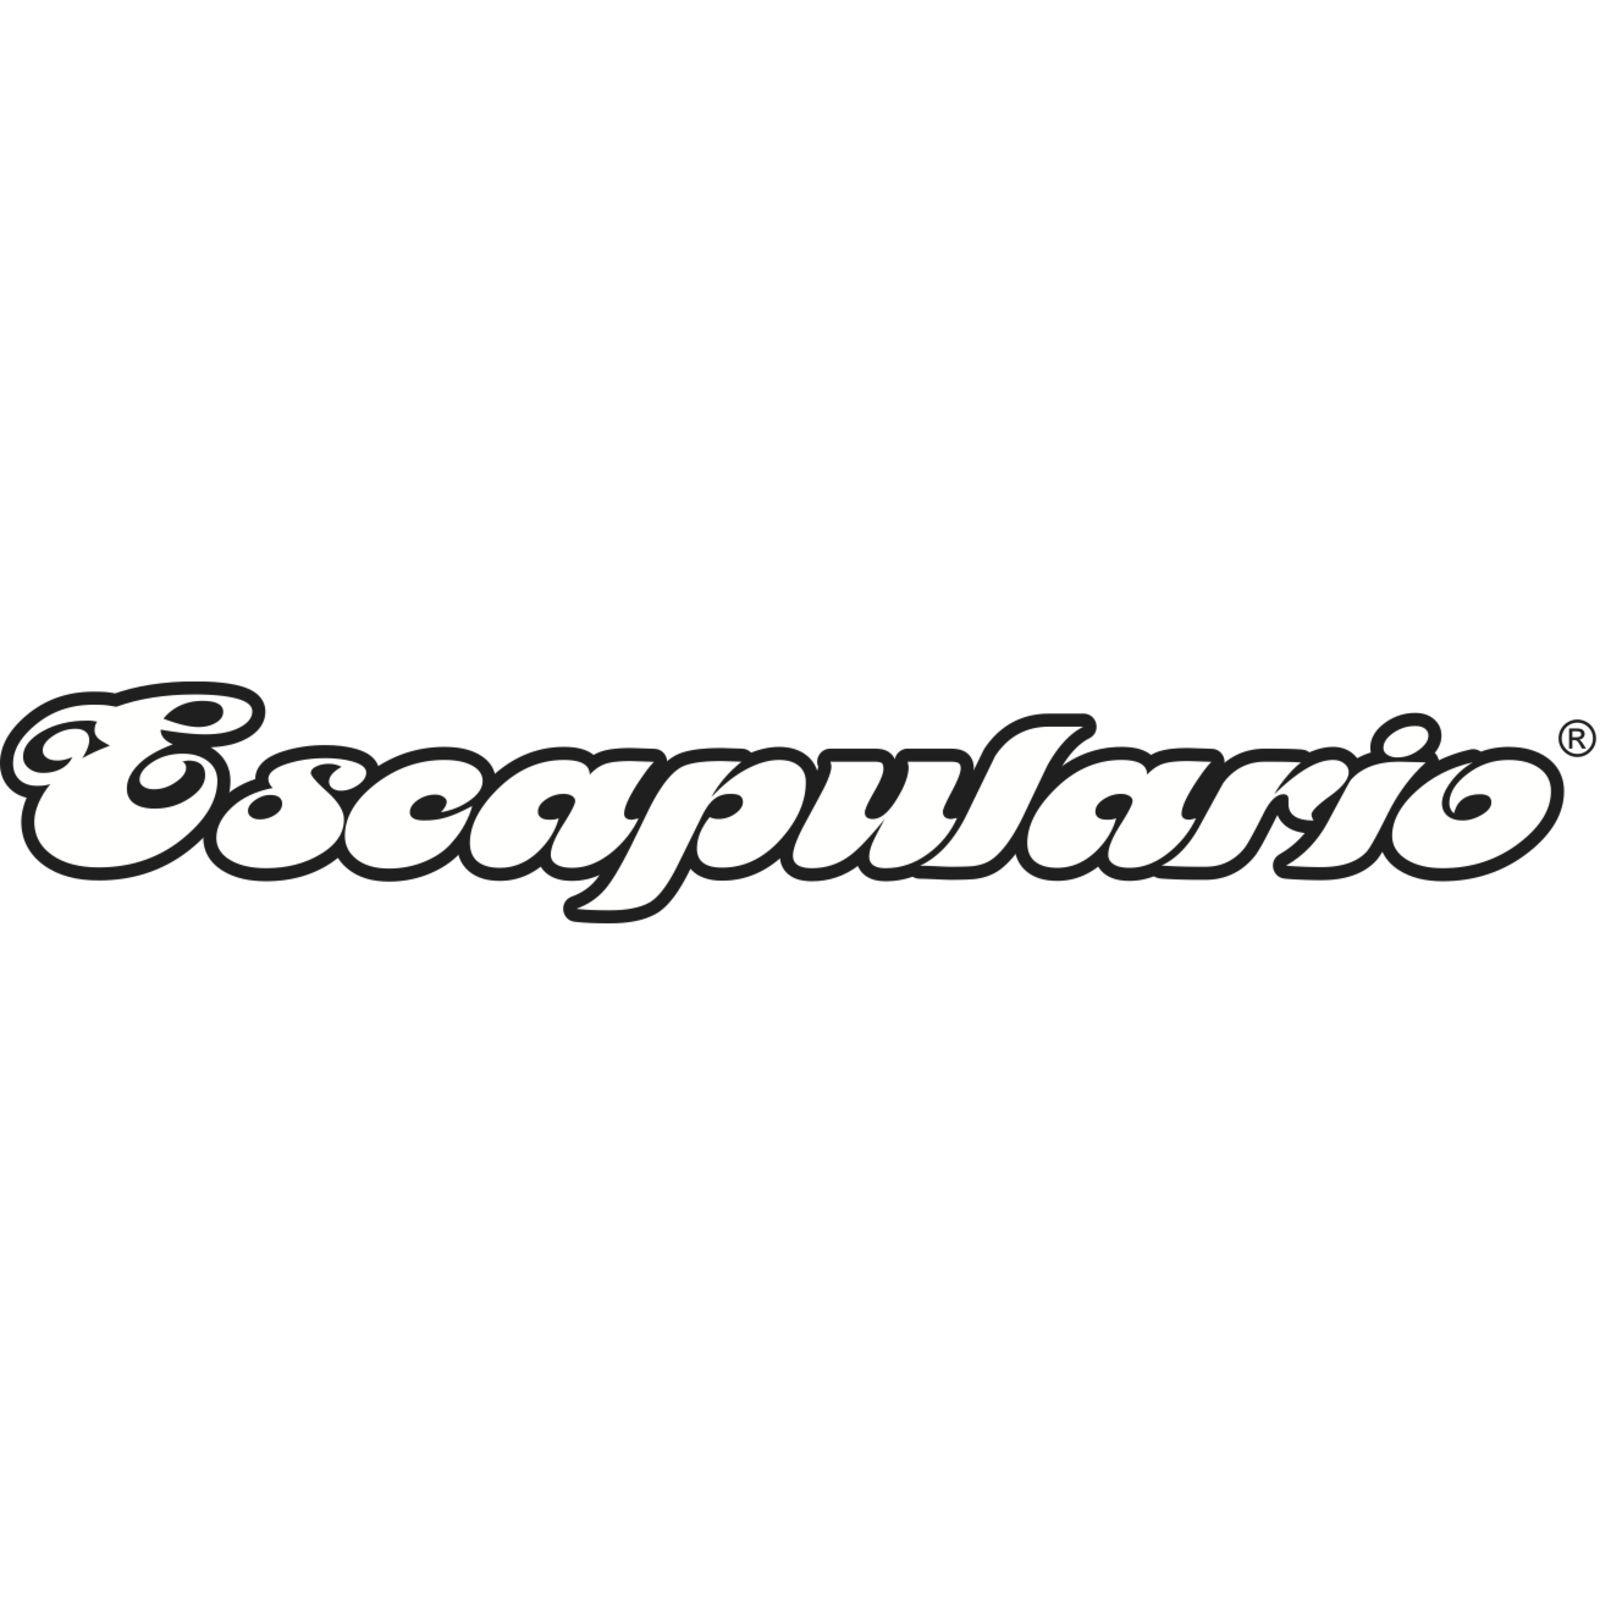 Escapulario® (Image 1)